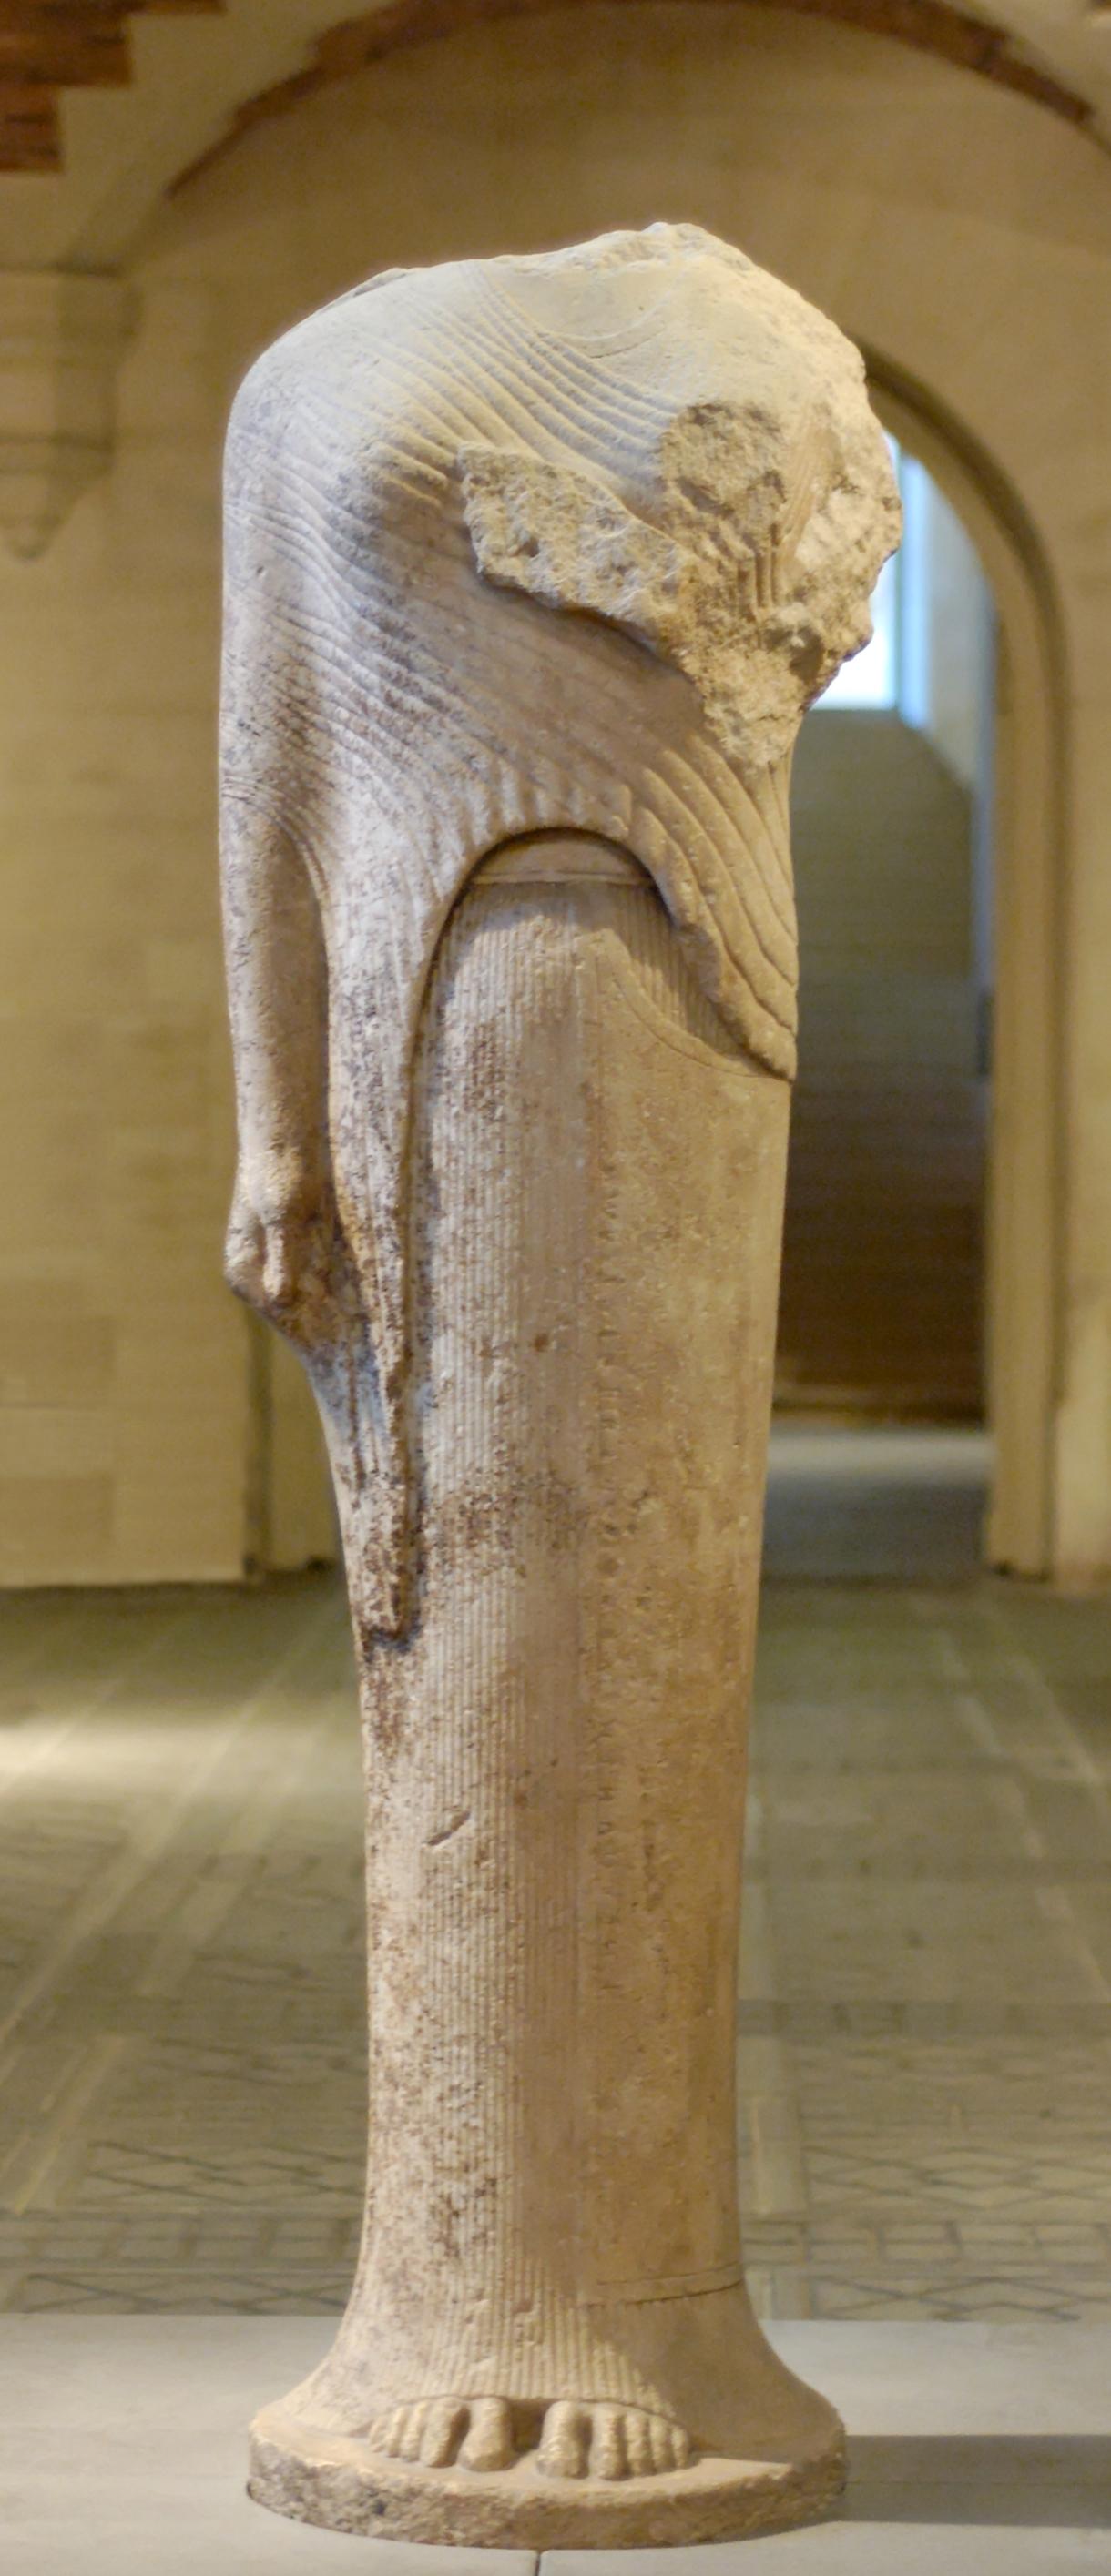 https://i2.wp.com/upload.wikimedia.org/wikipedia/commons/3/36/Kore_Heraion_Samos_Louvre_Ma686.jpg